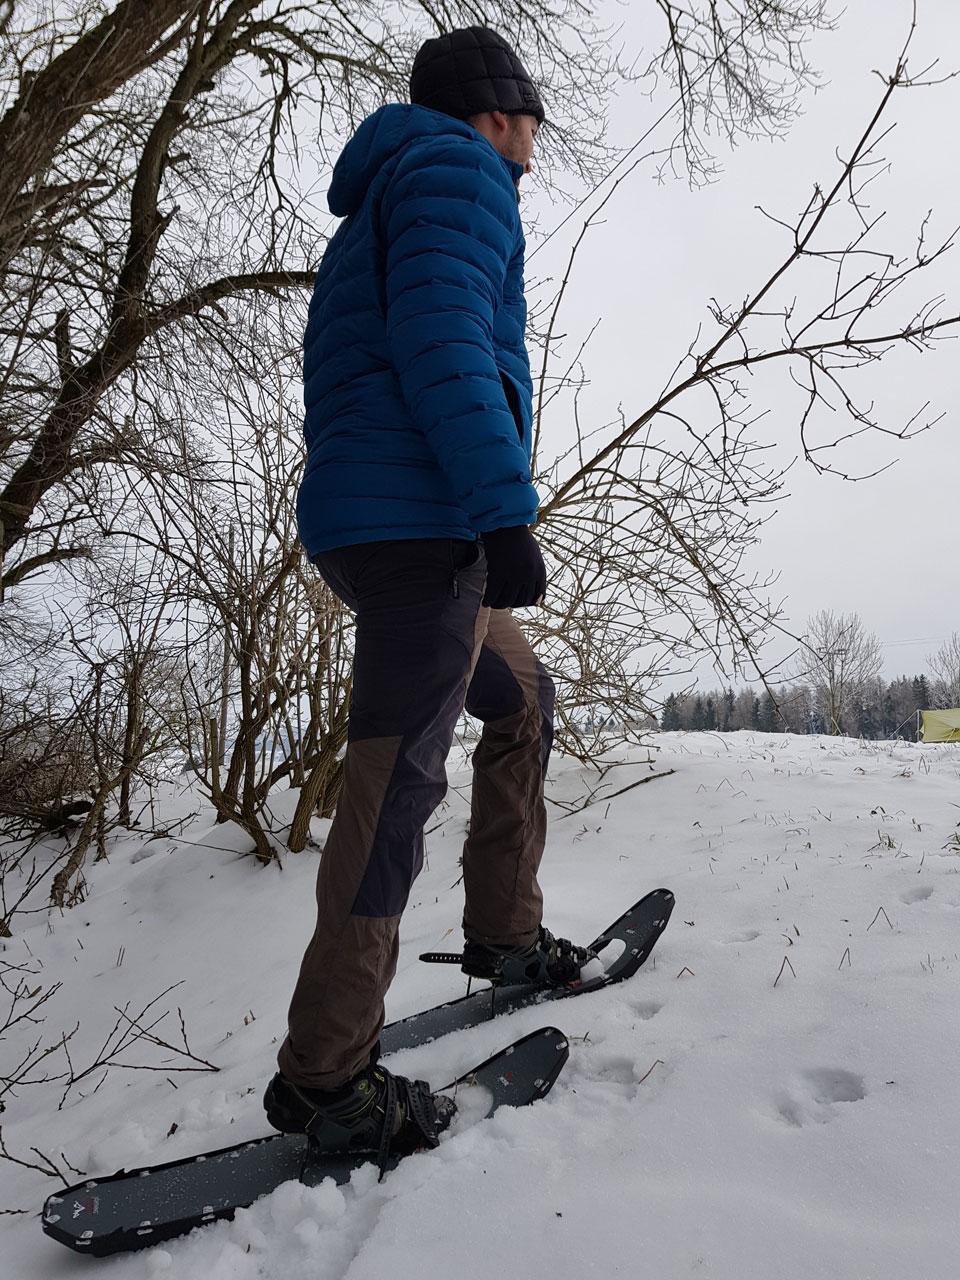 MSR Lightning Ascent Schneeschuhe Auftrieb